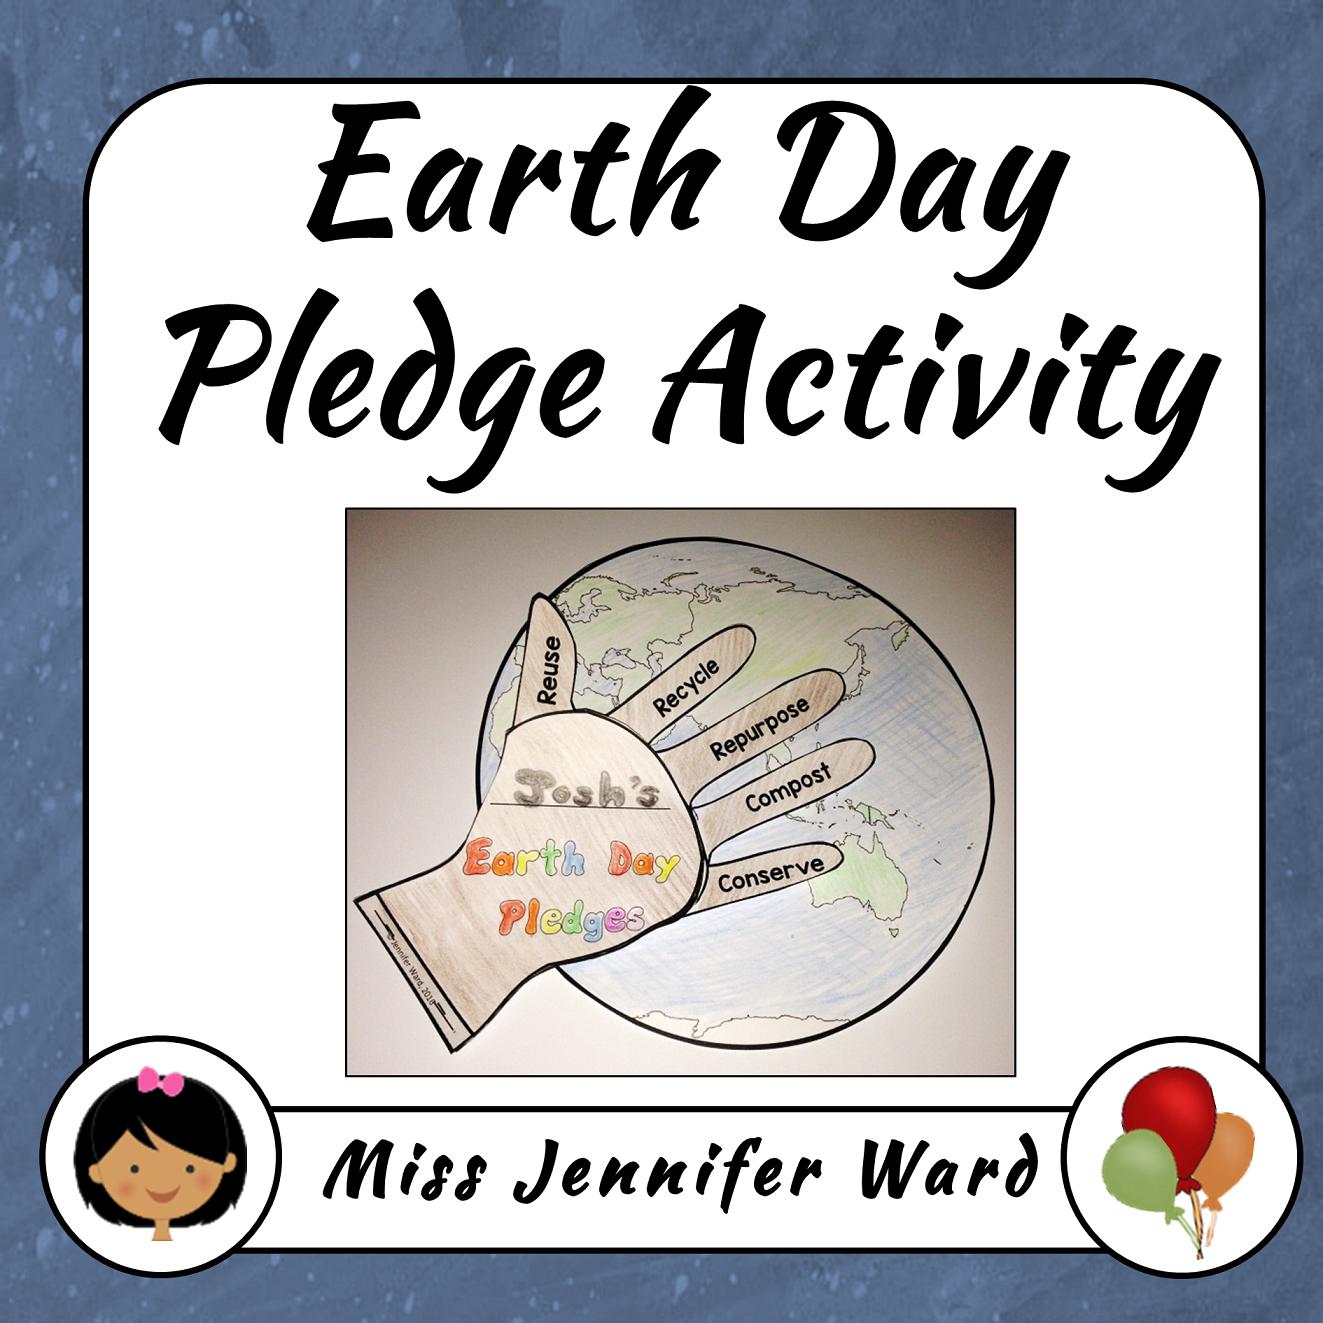 https://www.teacherspayteachers.com/Product/Earth-Day-Pledge-Activity-2467088